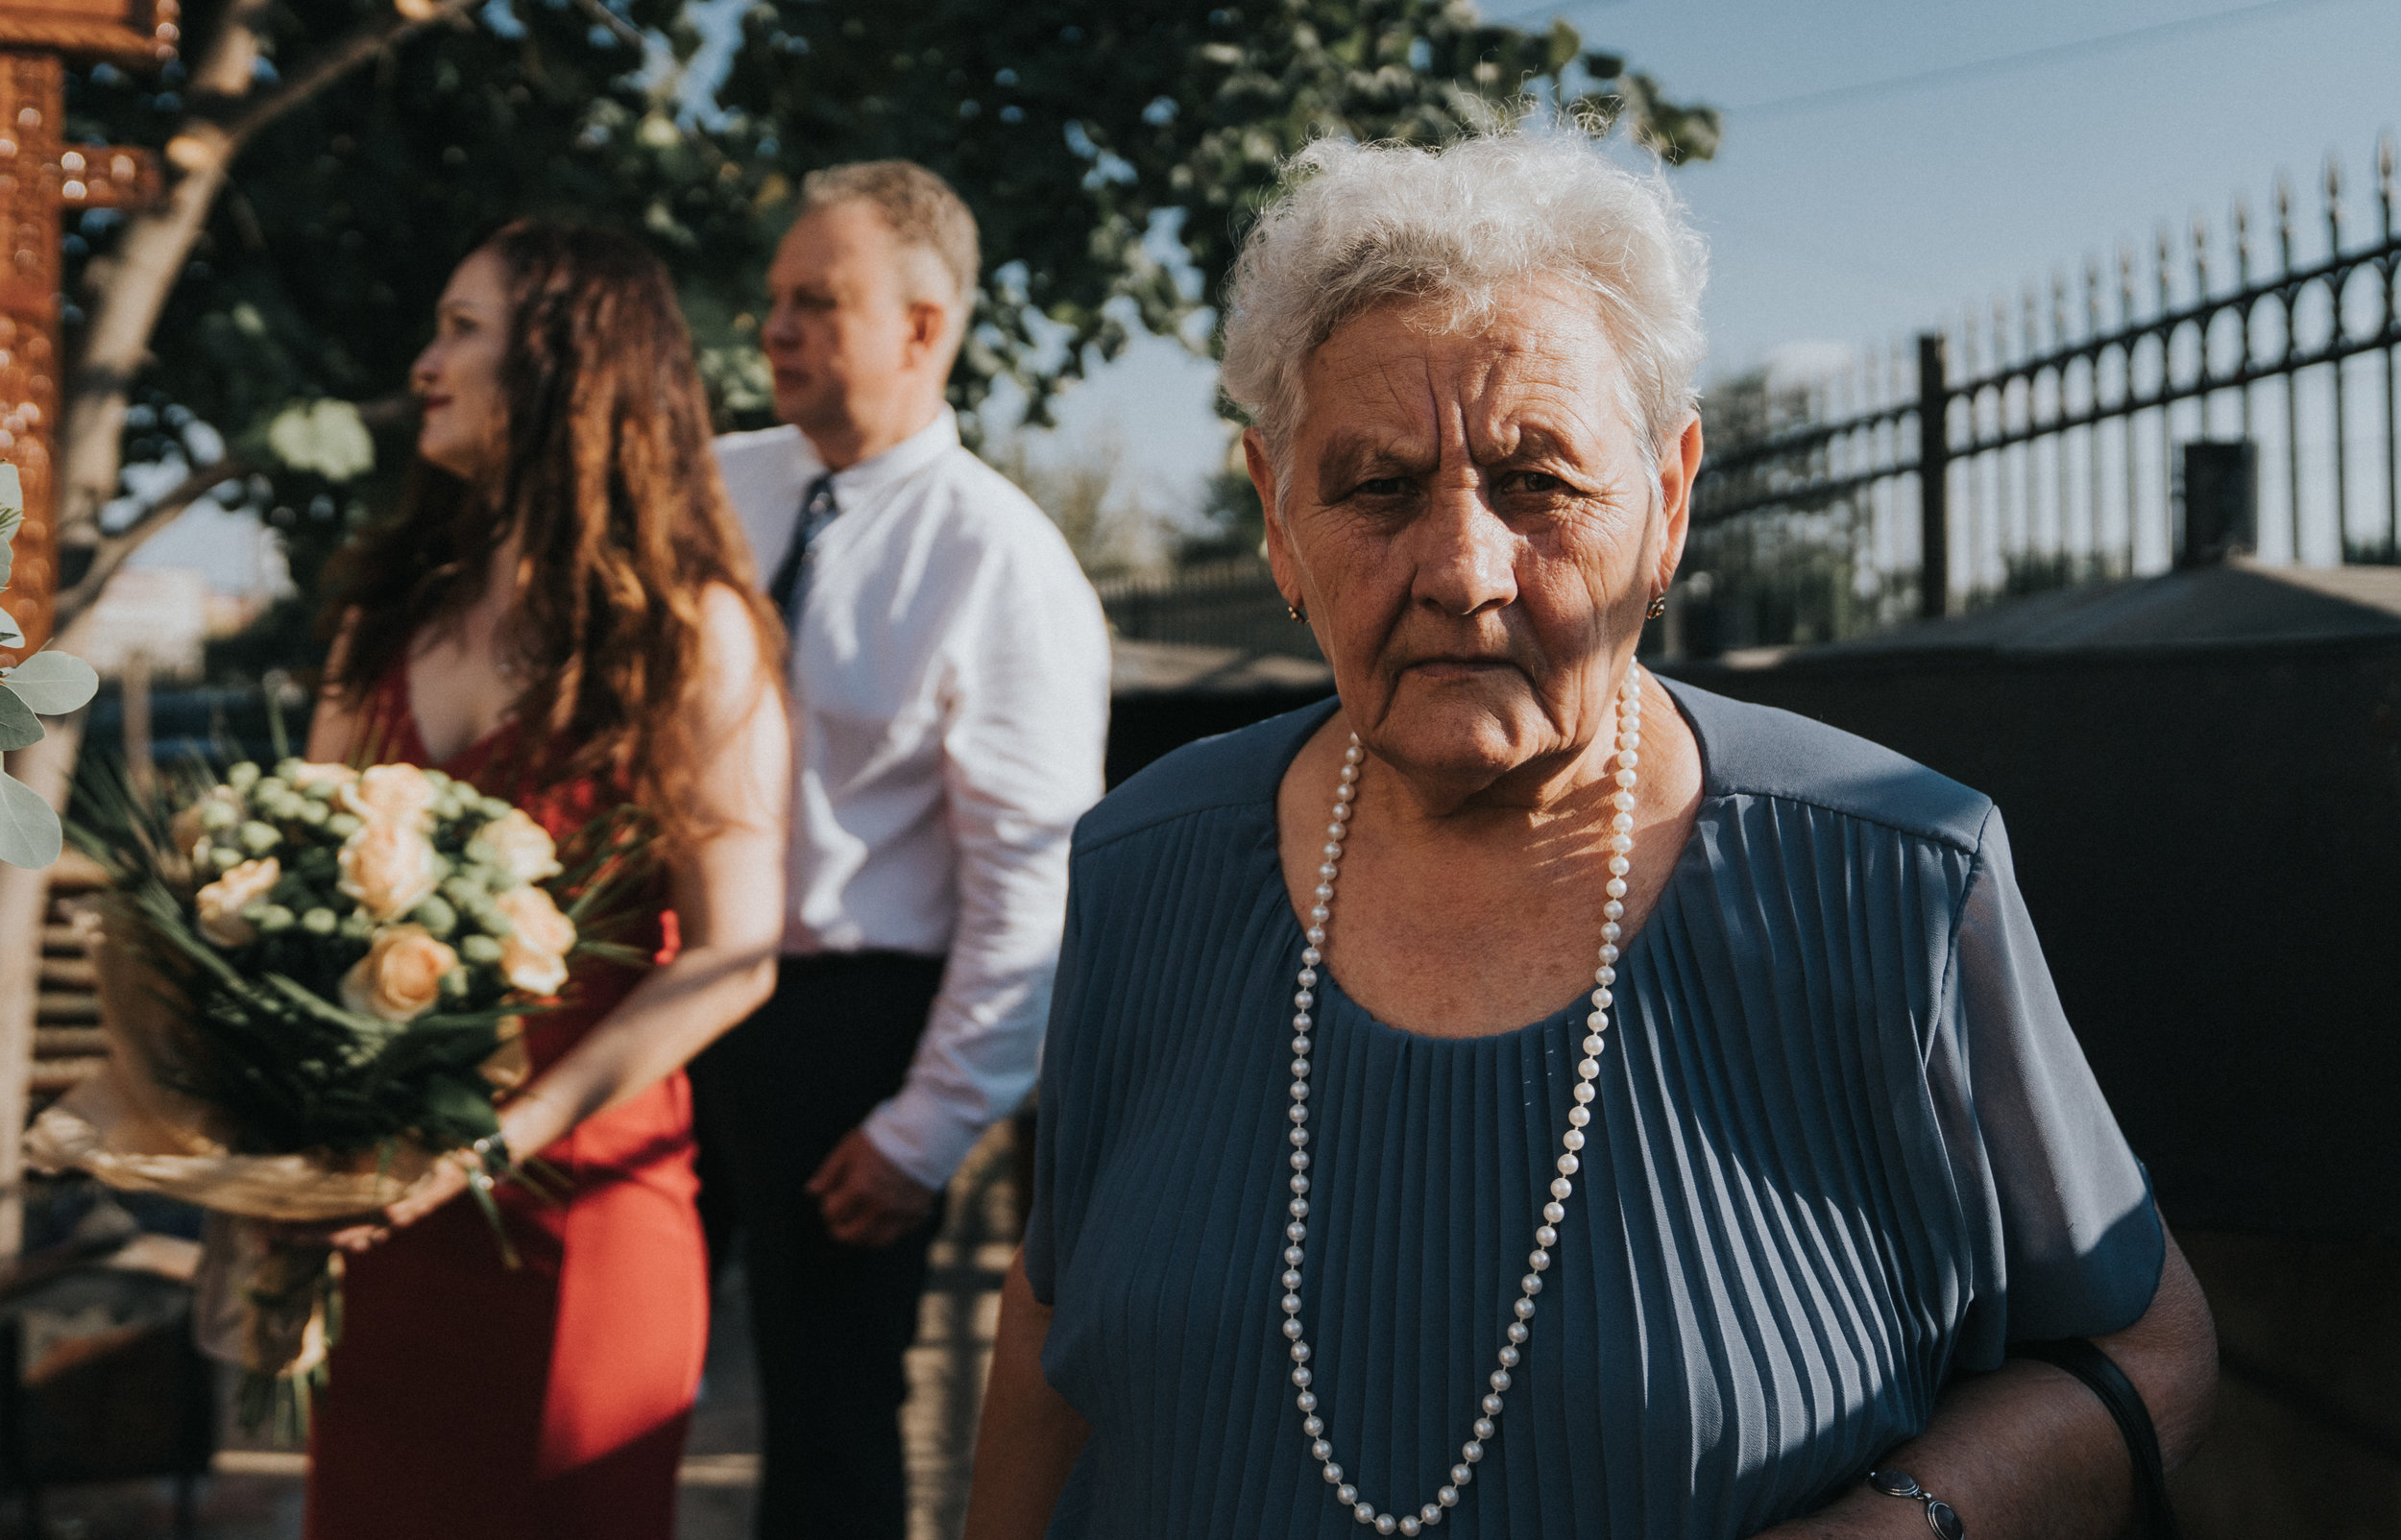 london-romania-destination-wedding-photographer-videographer-80